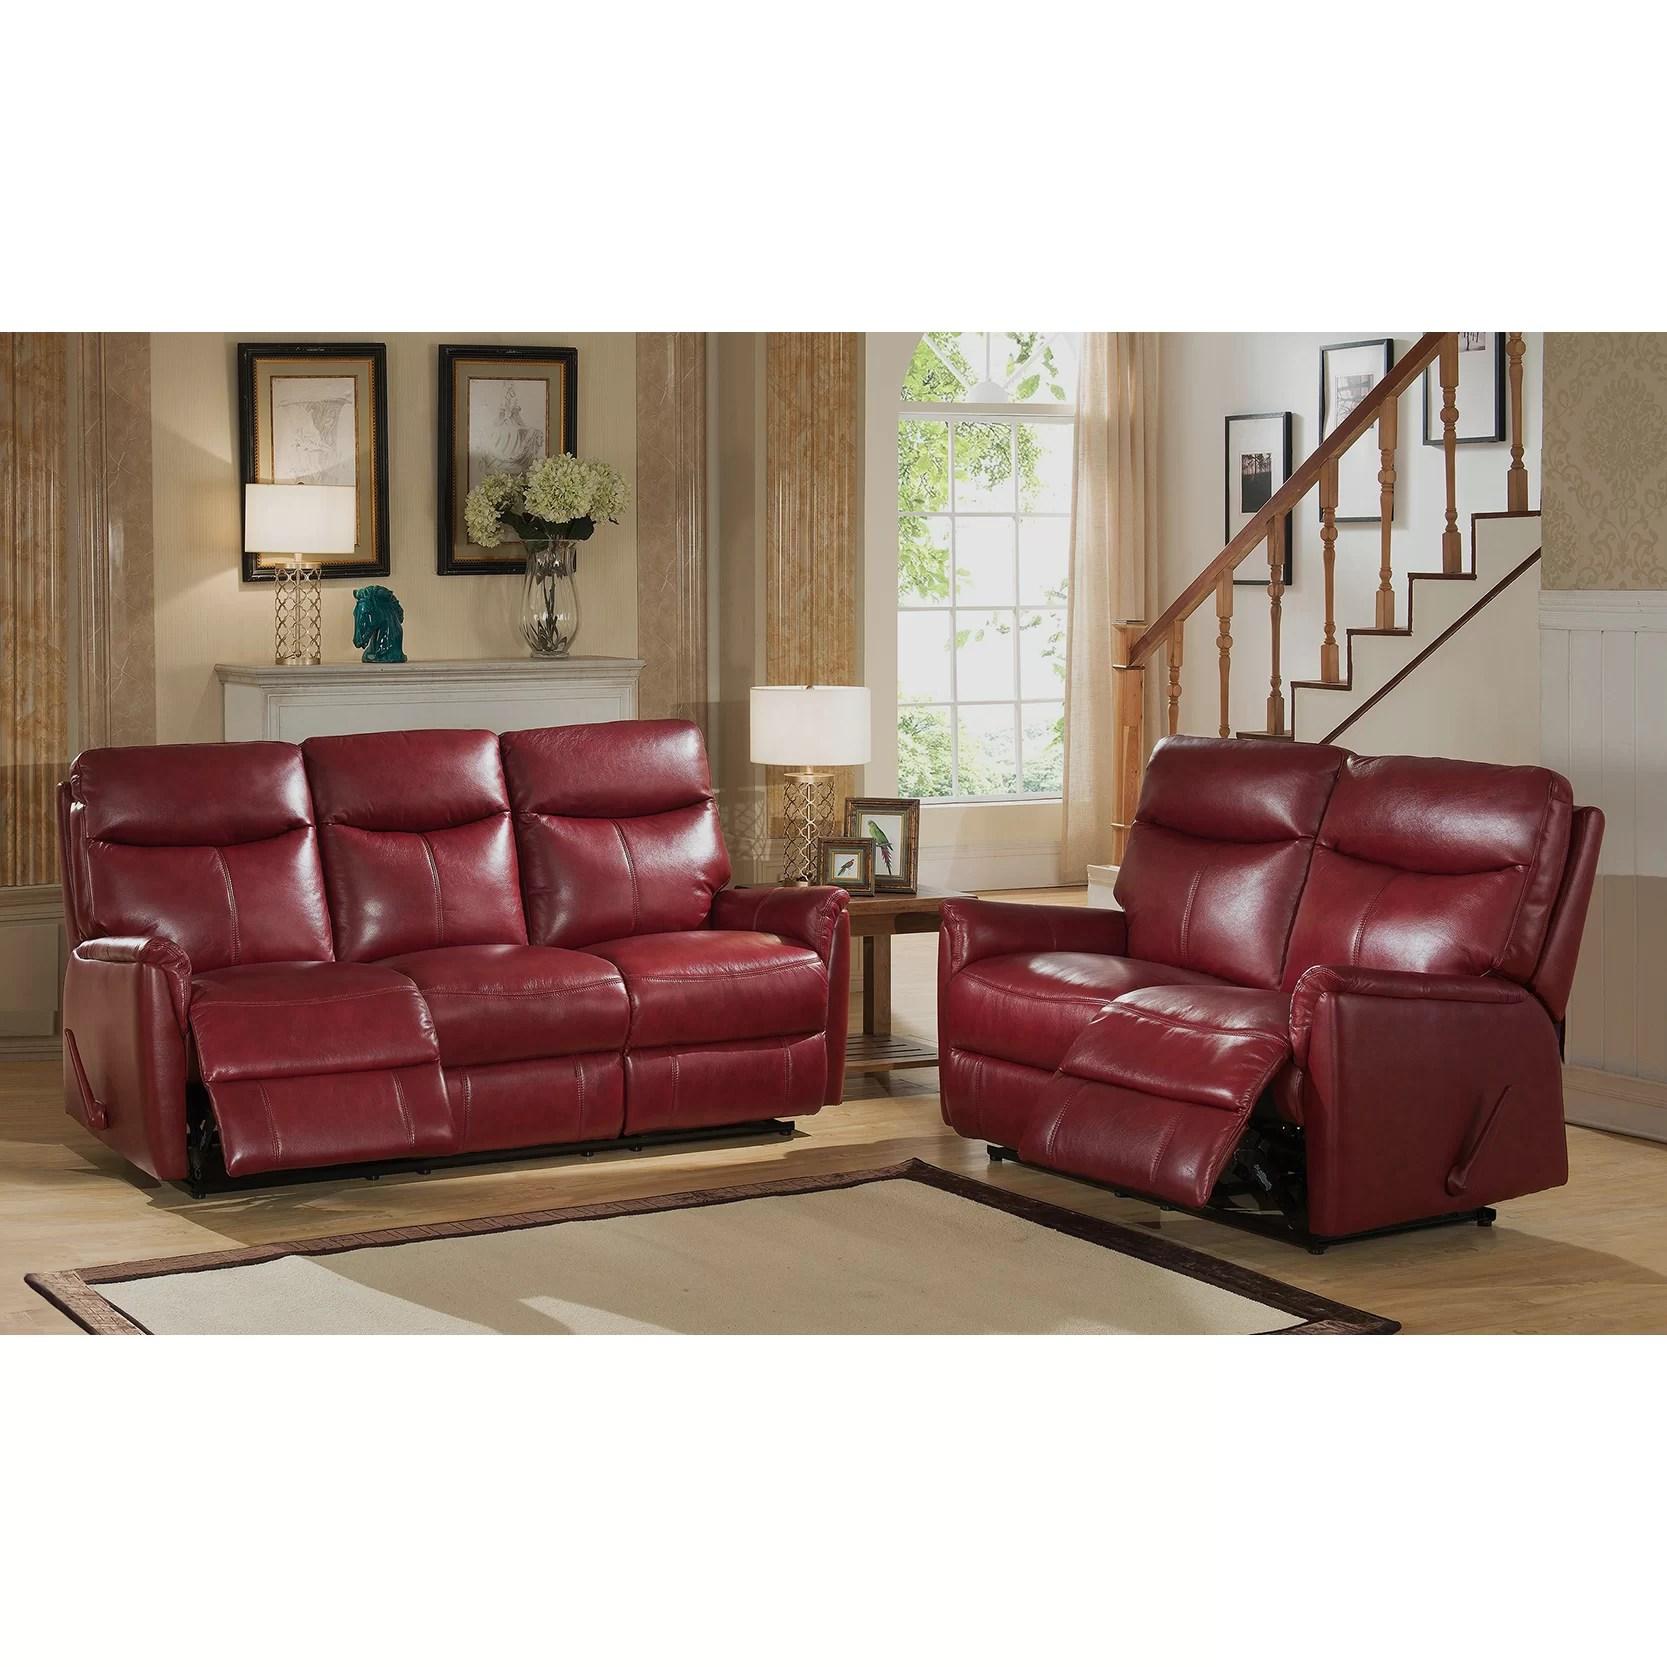 Amax Napa Top Grain Leather Lay Flat Reclining Sofa And